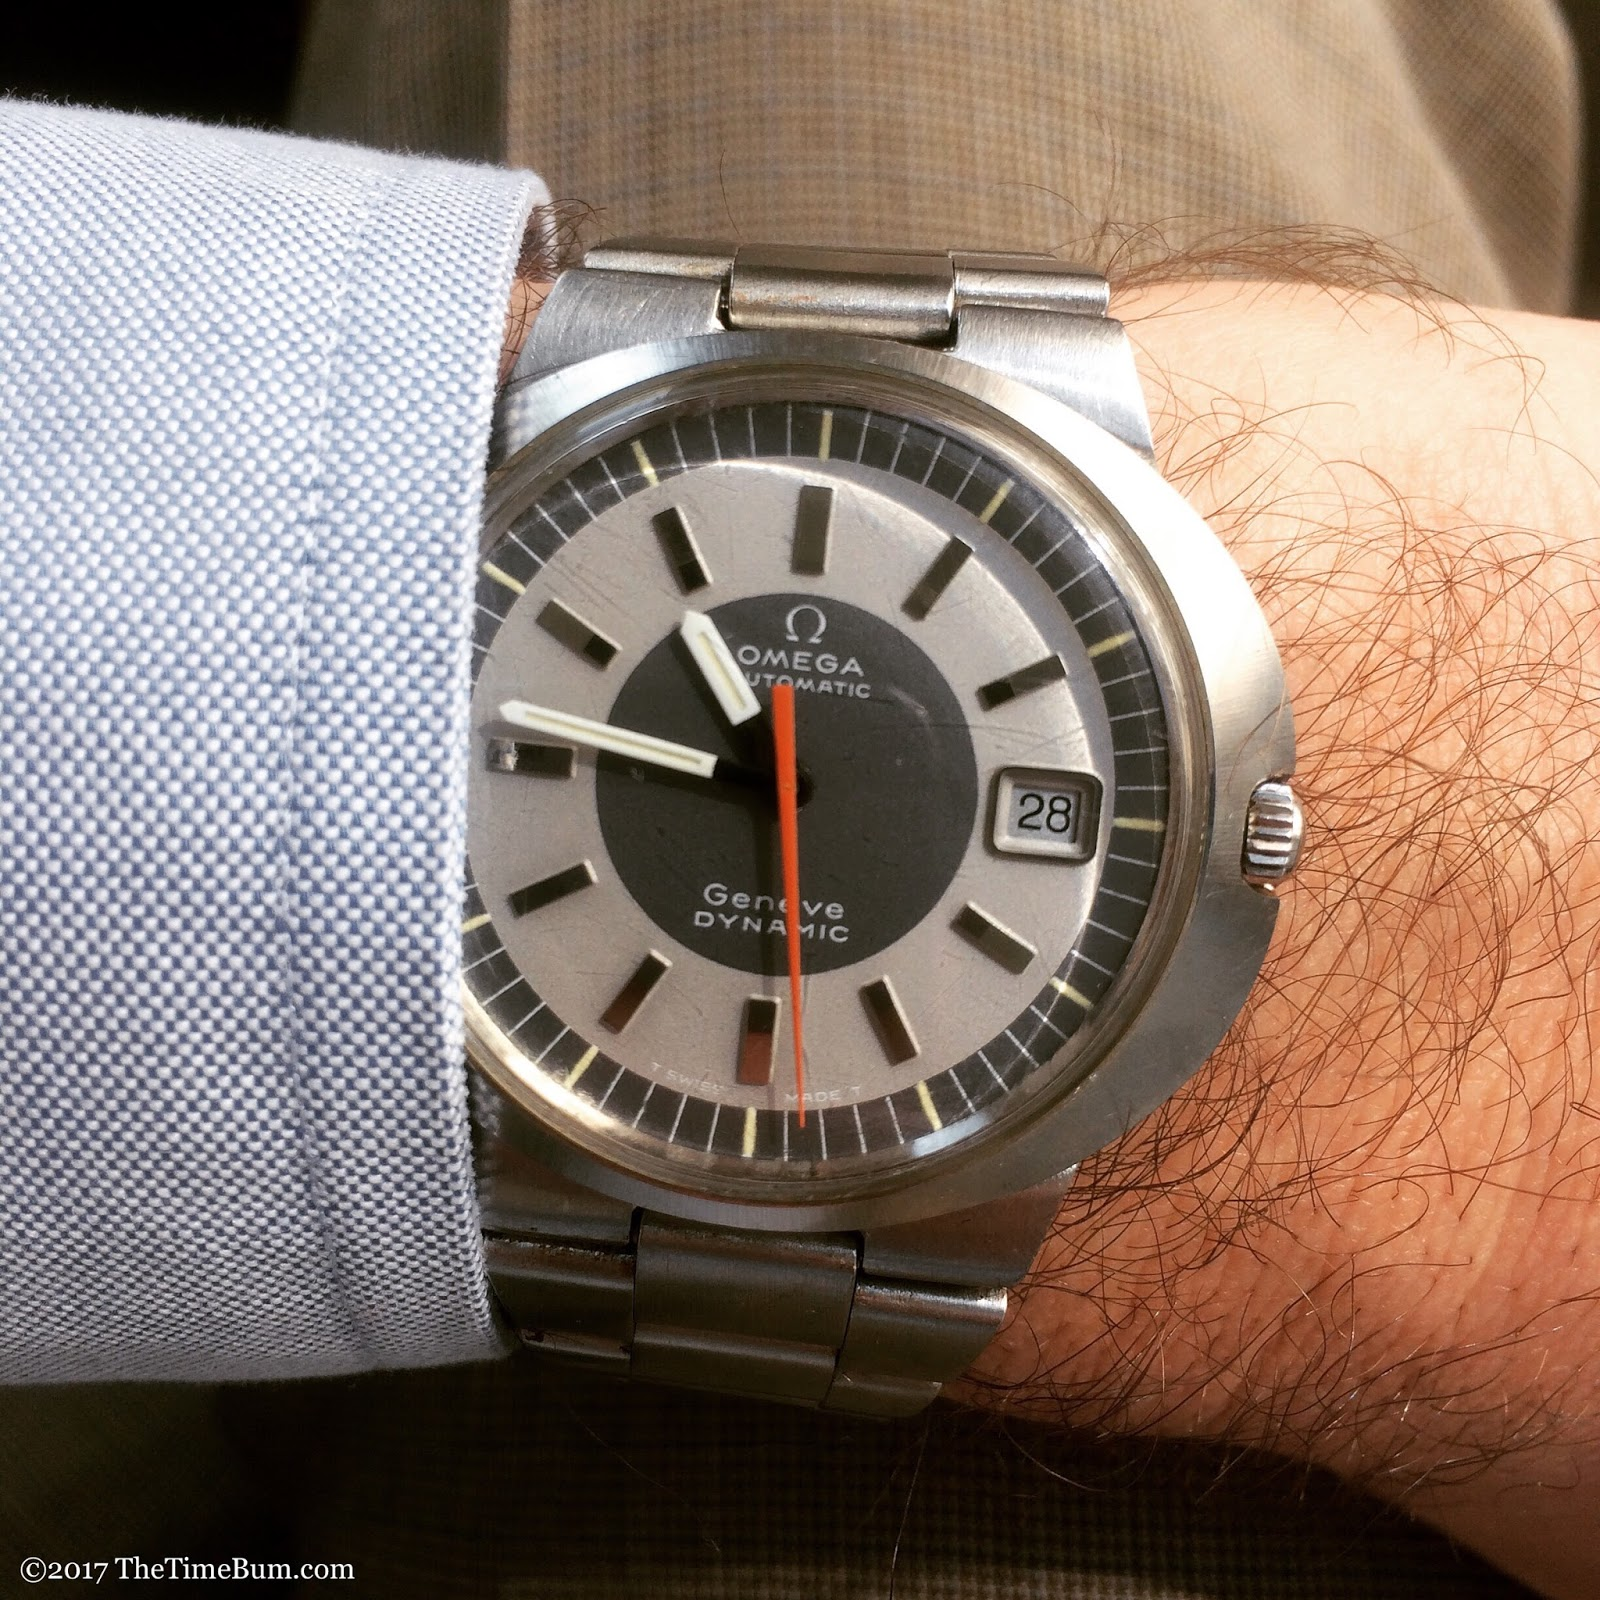 Omega Dynamic wrist